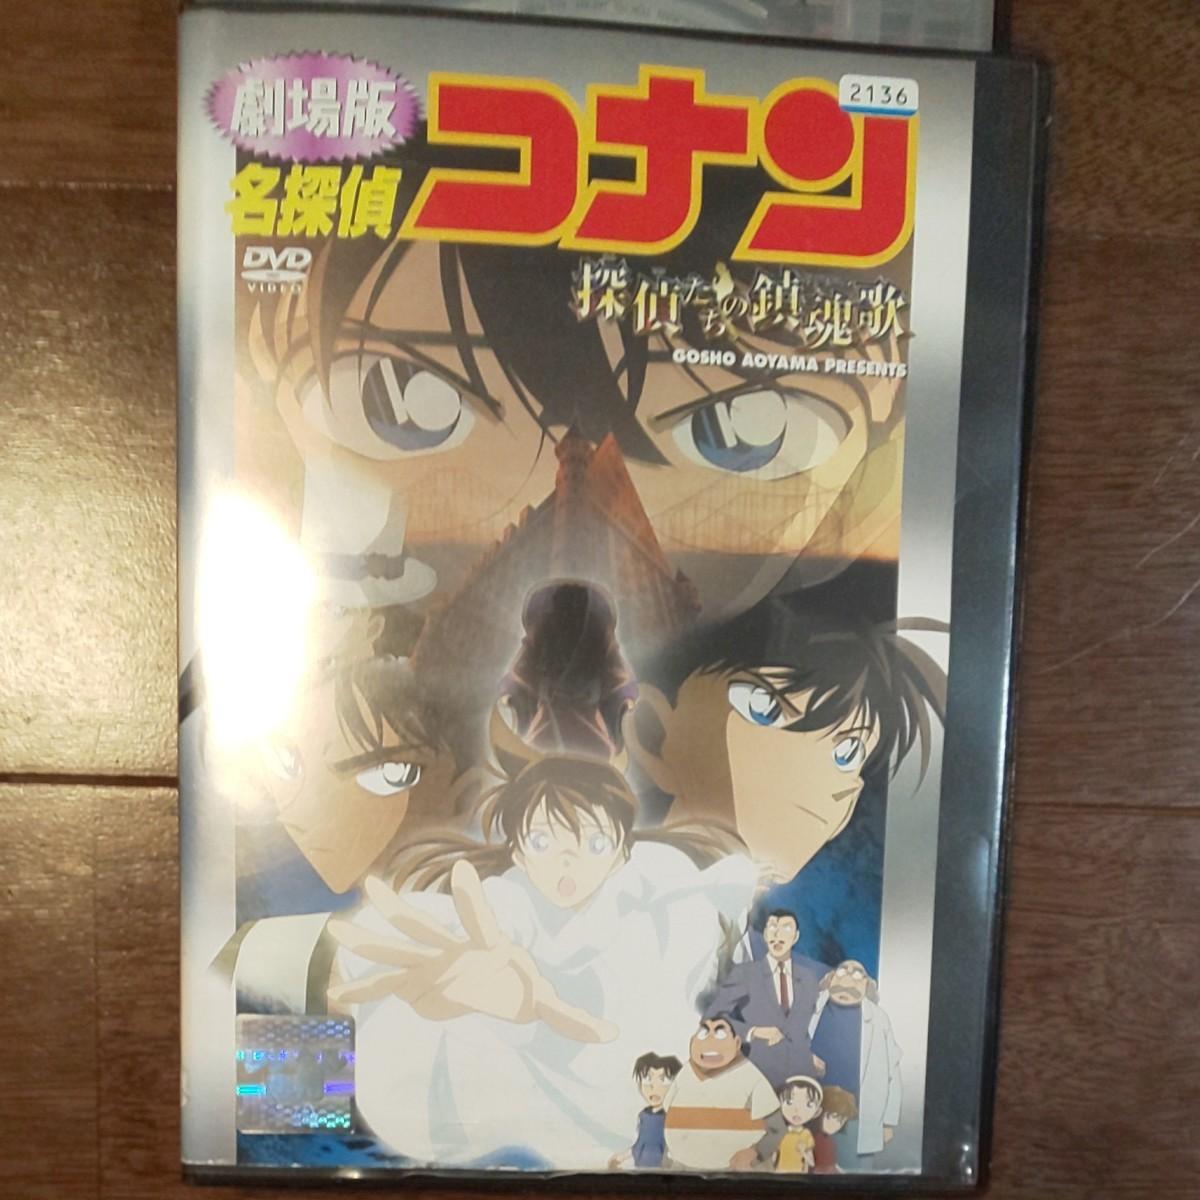 DVD 劇場版 名探偵コナン探偵たちの鎮魂歌 レンタル落ち  コナン